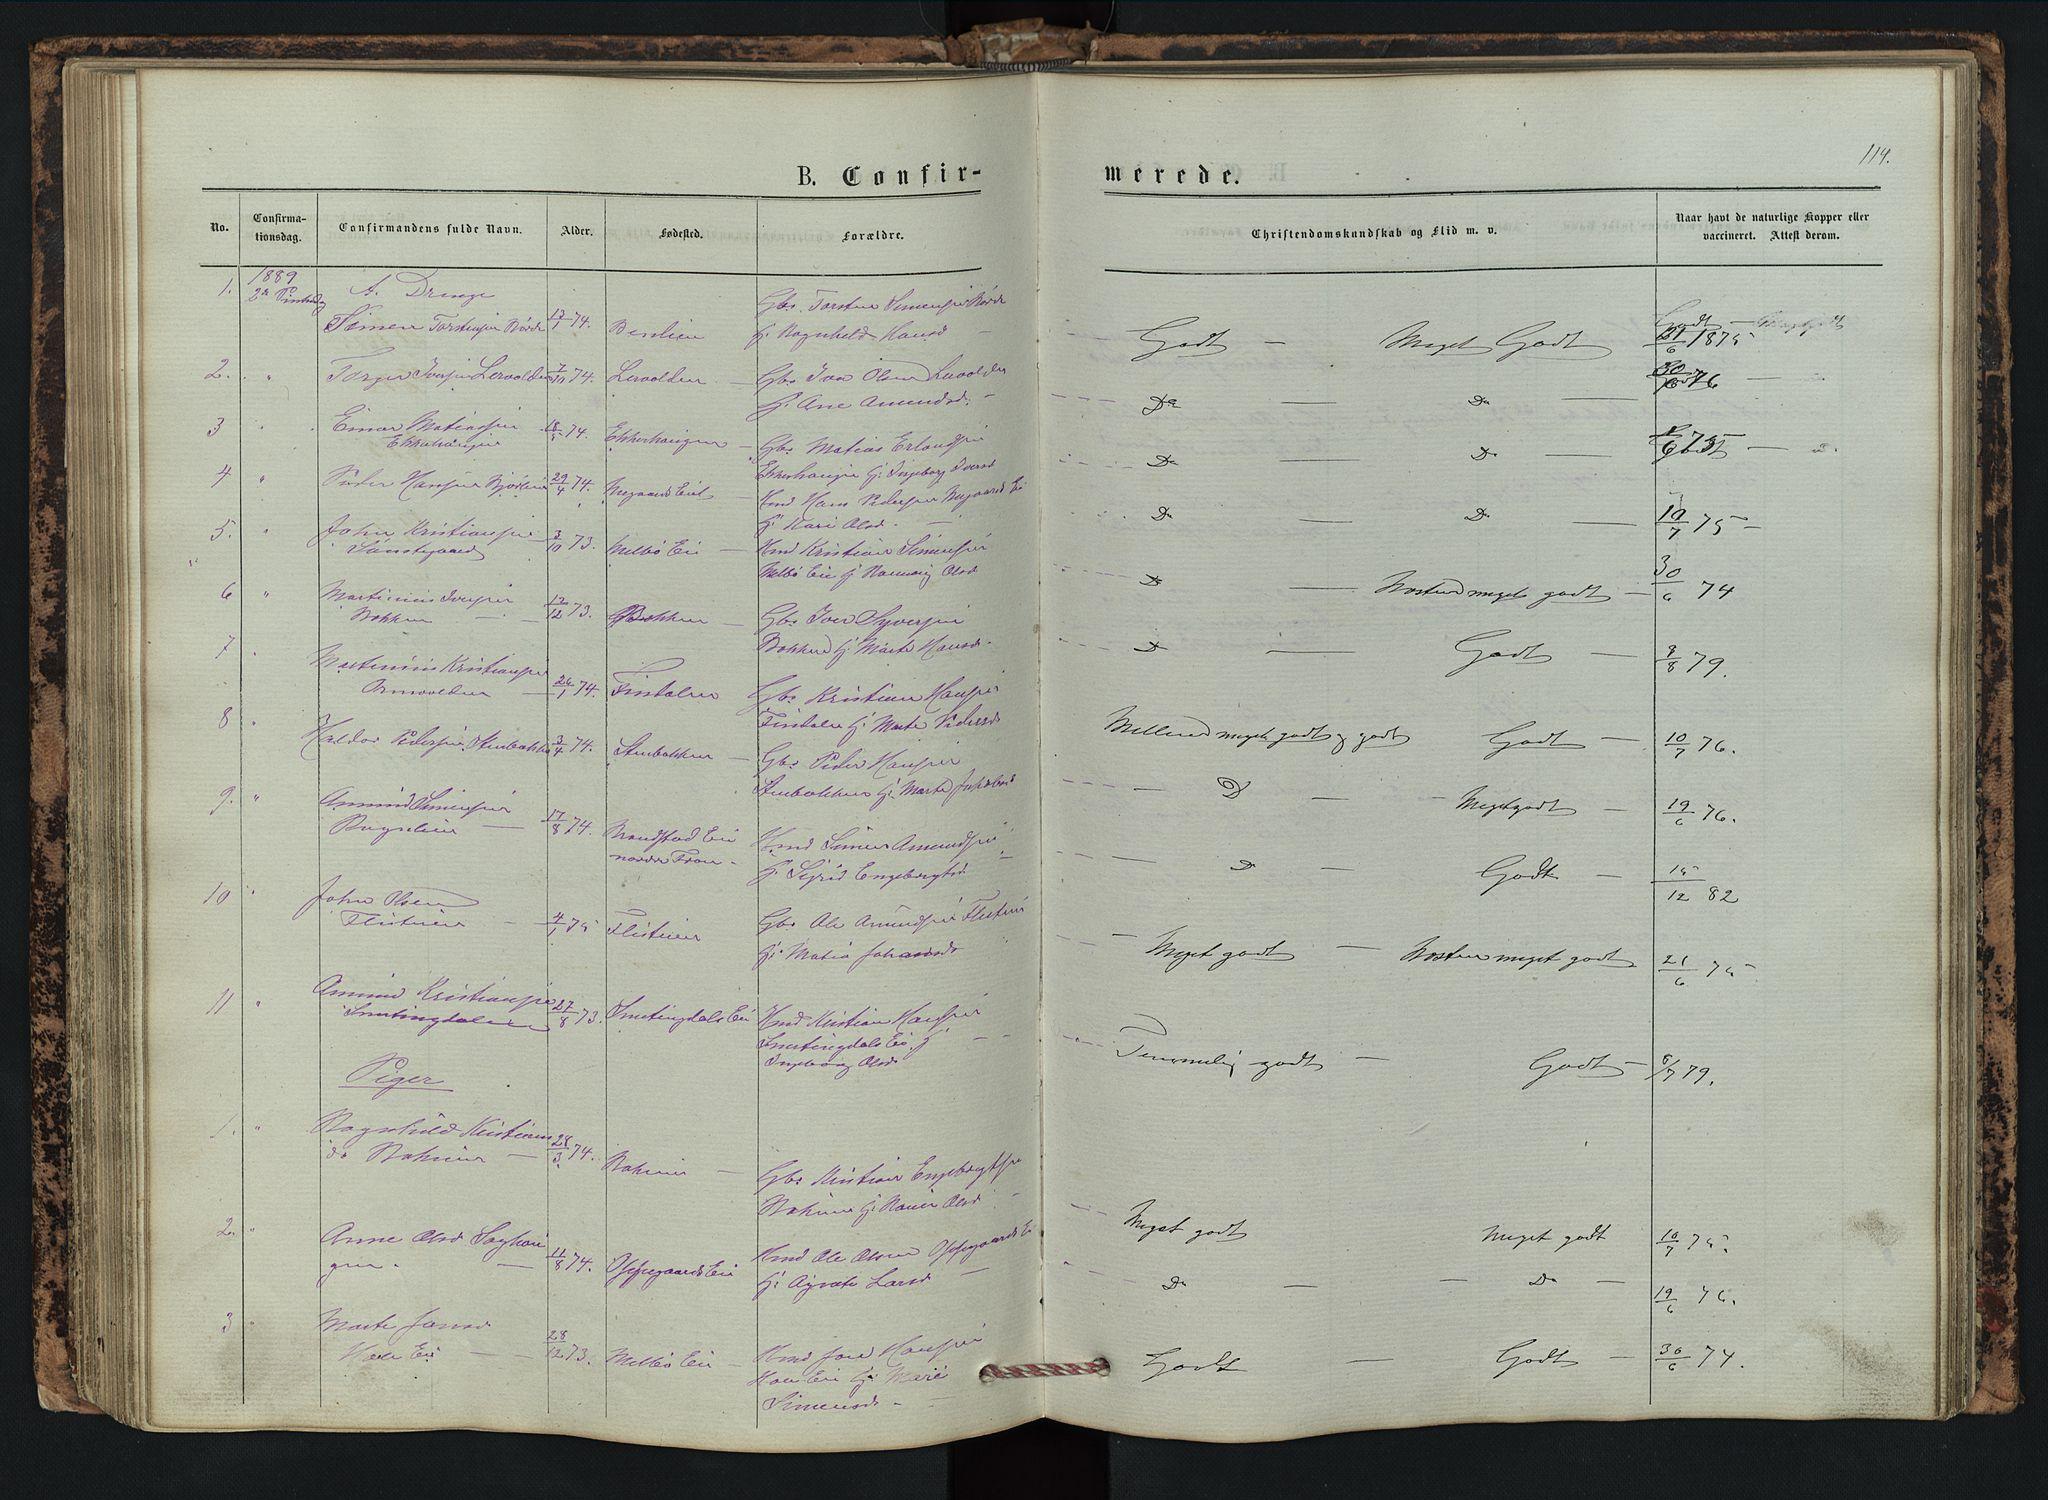 SAH, Vestre Gausdal prestekontor, Klokkerbok nr. 2, 1874-1897, s. 114